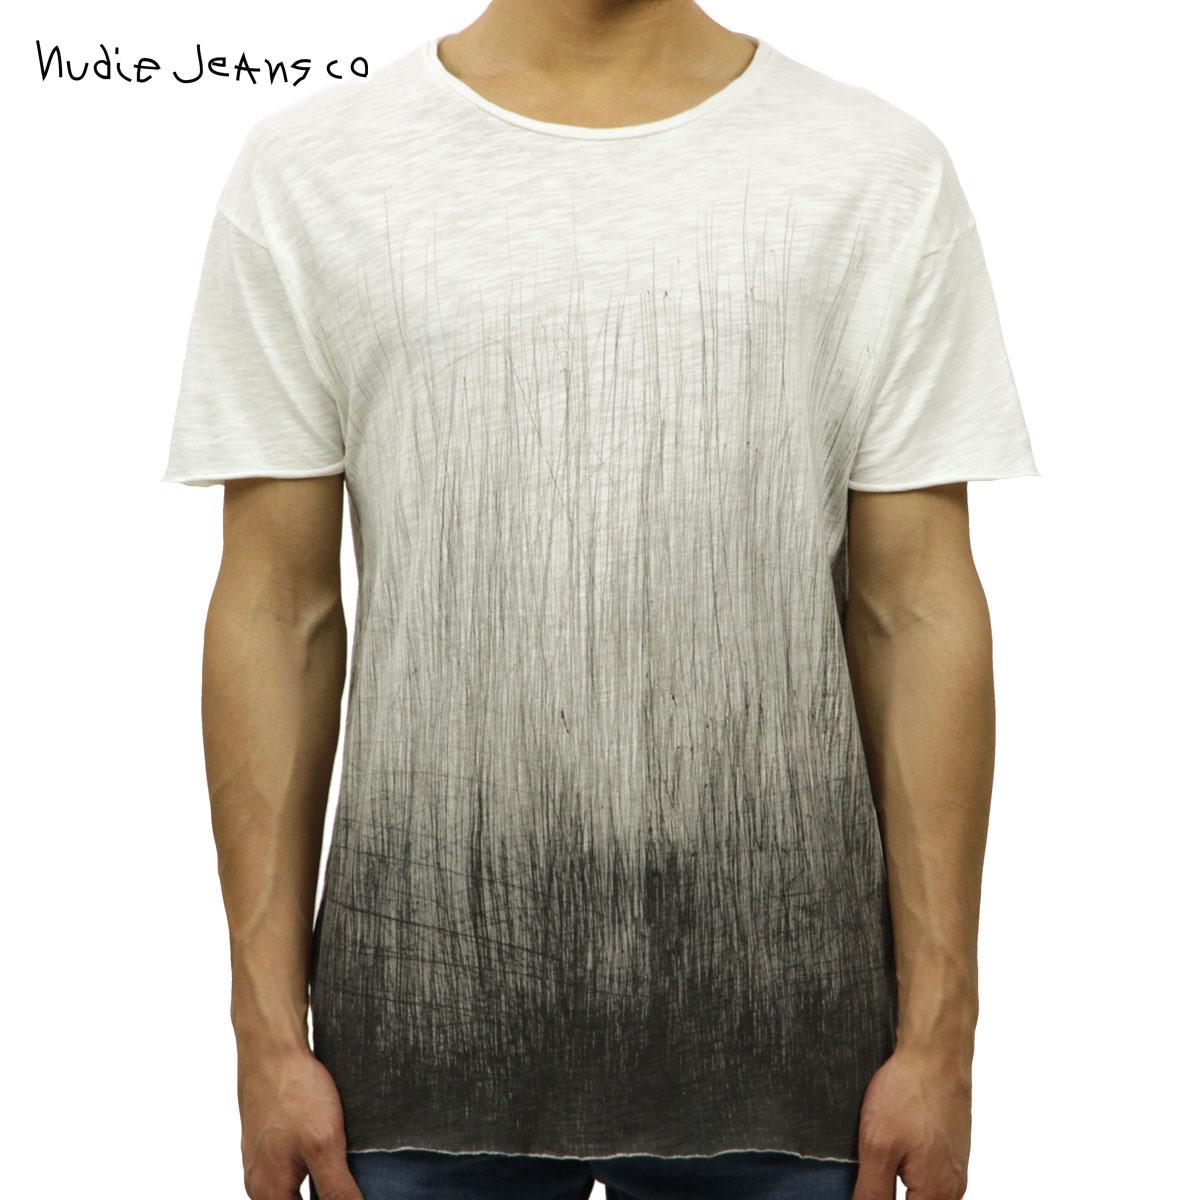 20%OFFセール 【販売期間 12/19 20:00~12/26 01:59】 ヌーディージーンズ Tシャツ 正規販売店 Nudie Jeans 半袖Tシャツ Raw Hem T-shirt 131352 4033 W08 Offwhite/Black